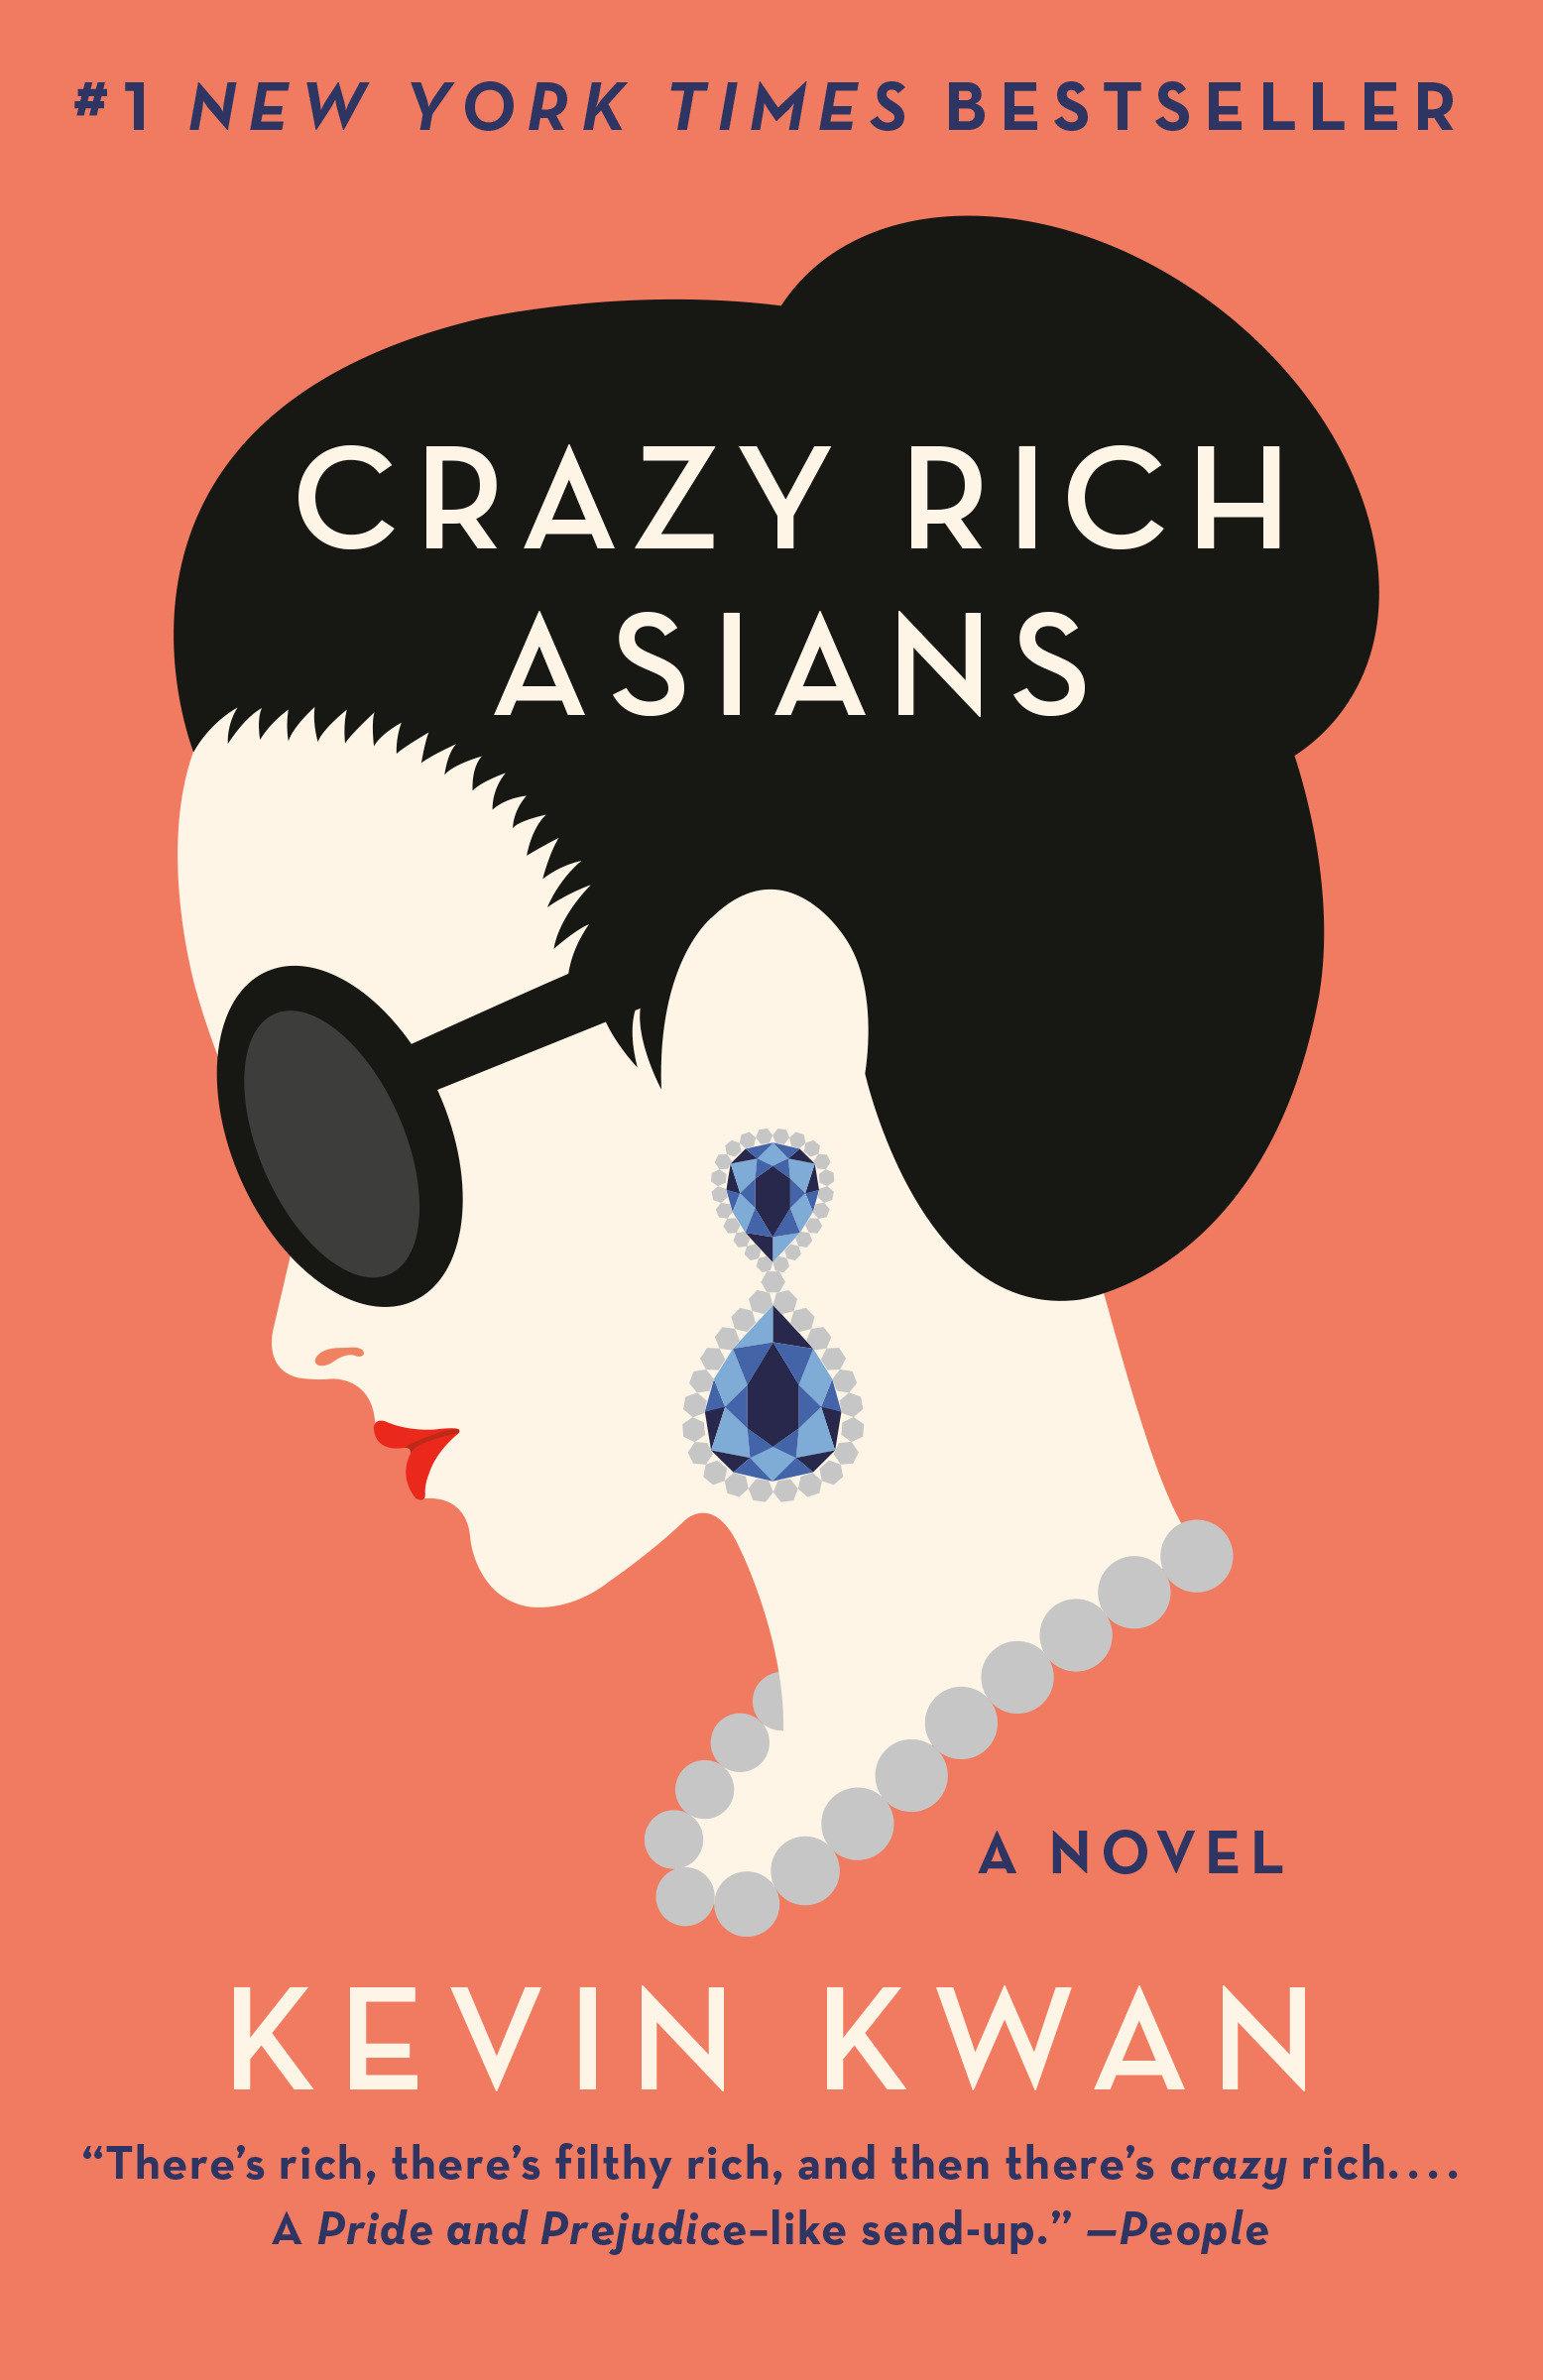 Crazy rich Asians cover image